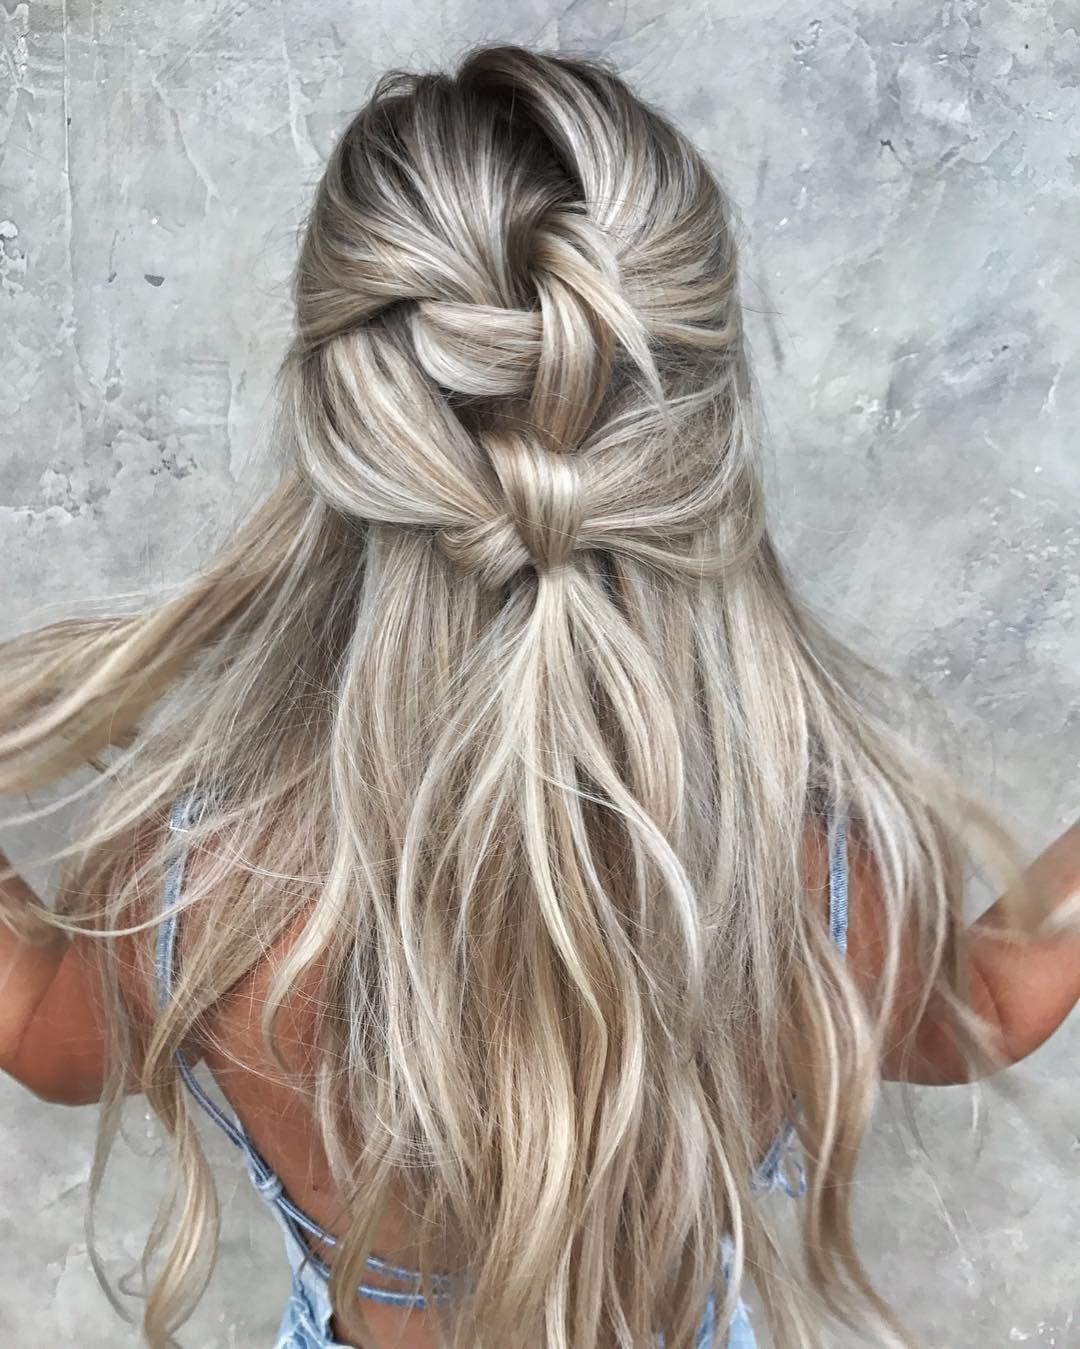 #knotbraid by #taylorlambhair • #color & #extensions @hairby_chrissy • #model @kendy.du ✨